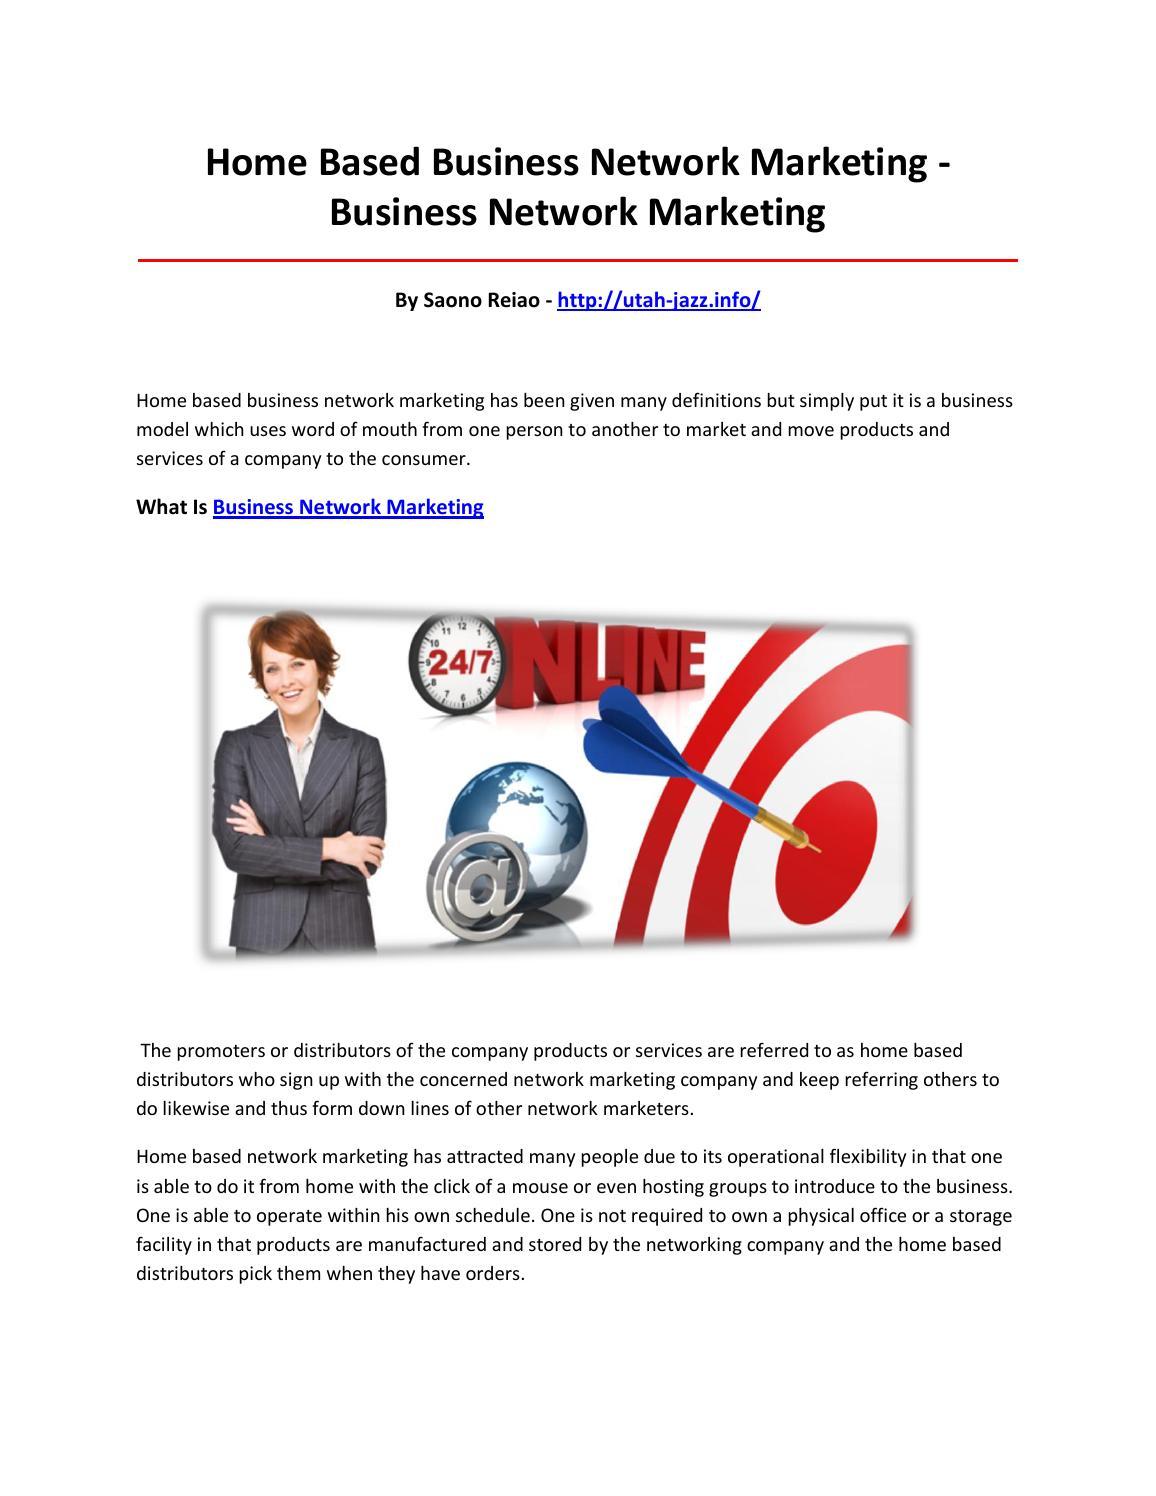 Business network marketing by yaere - issuu